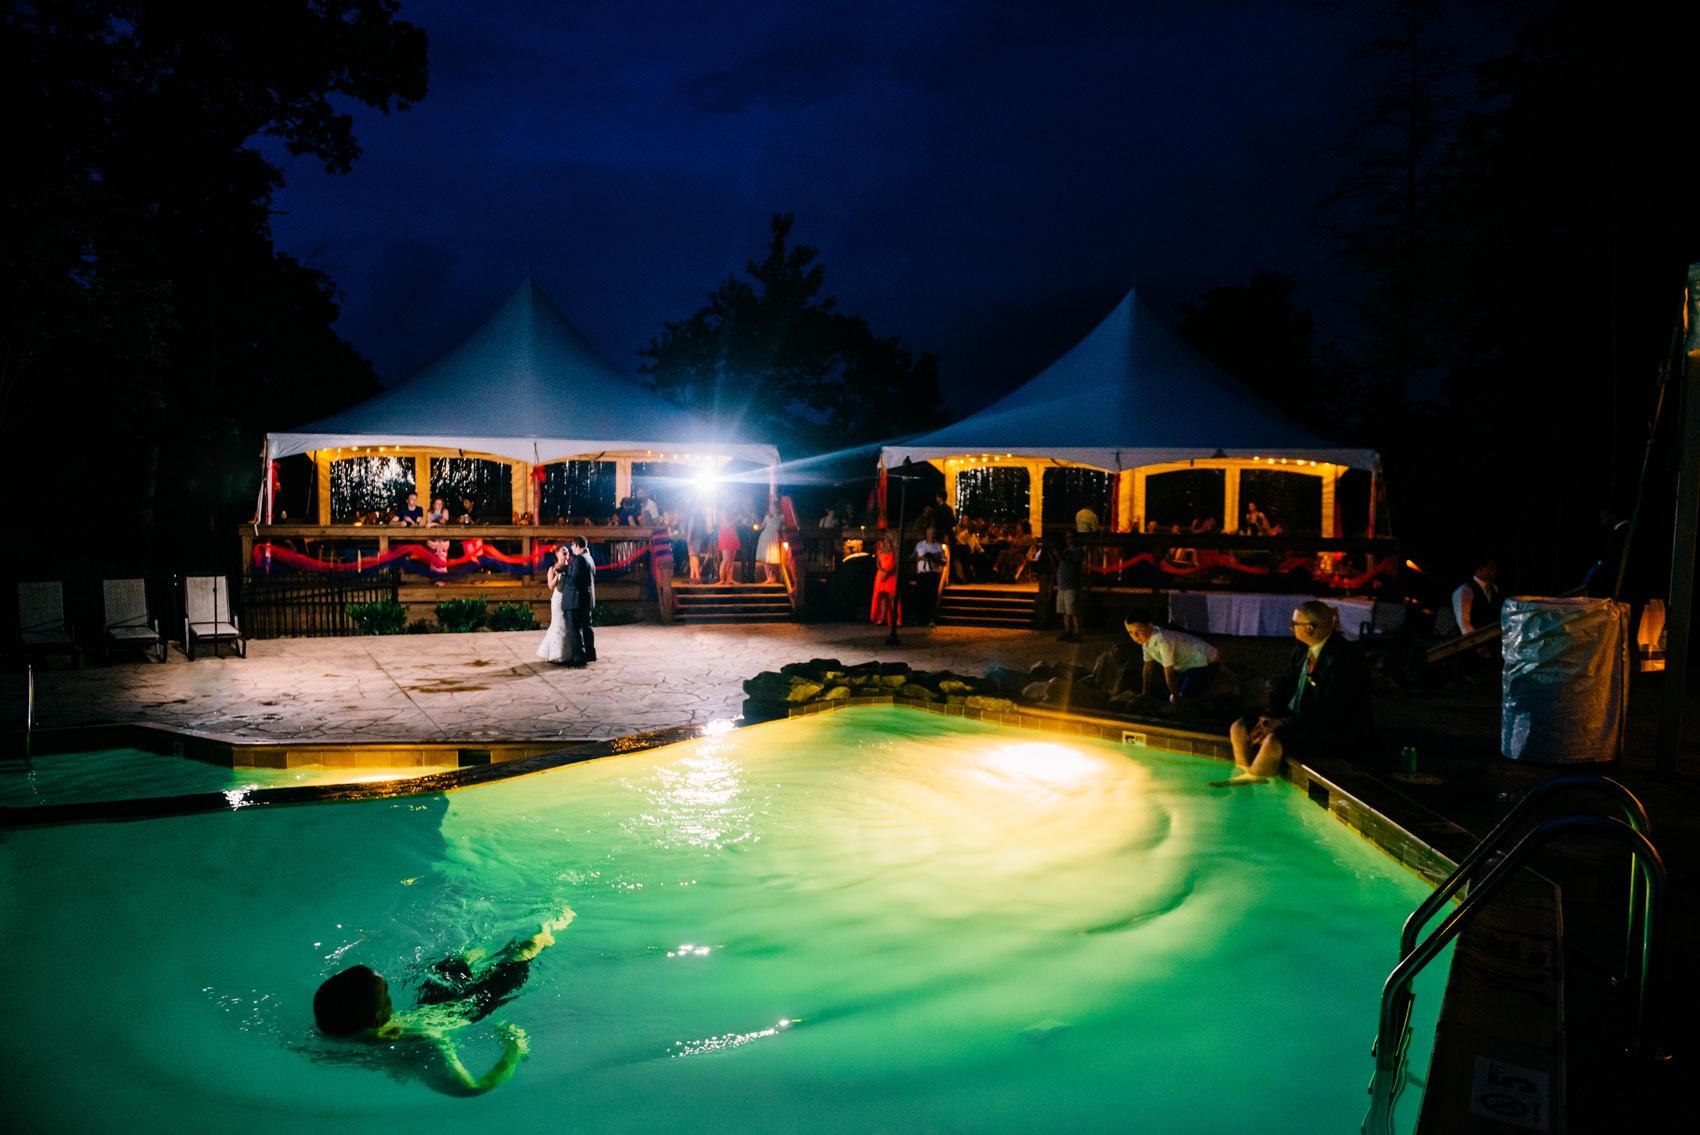 008-oberports-wedding-reception-portfolio